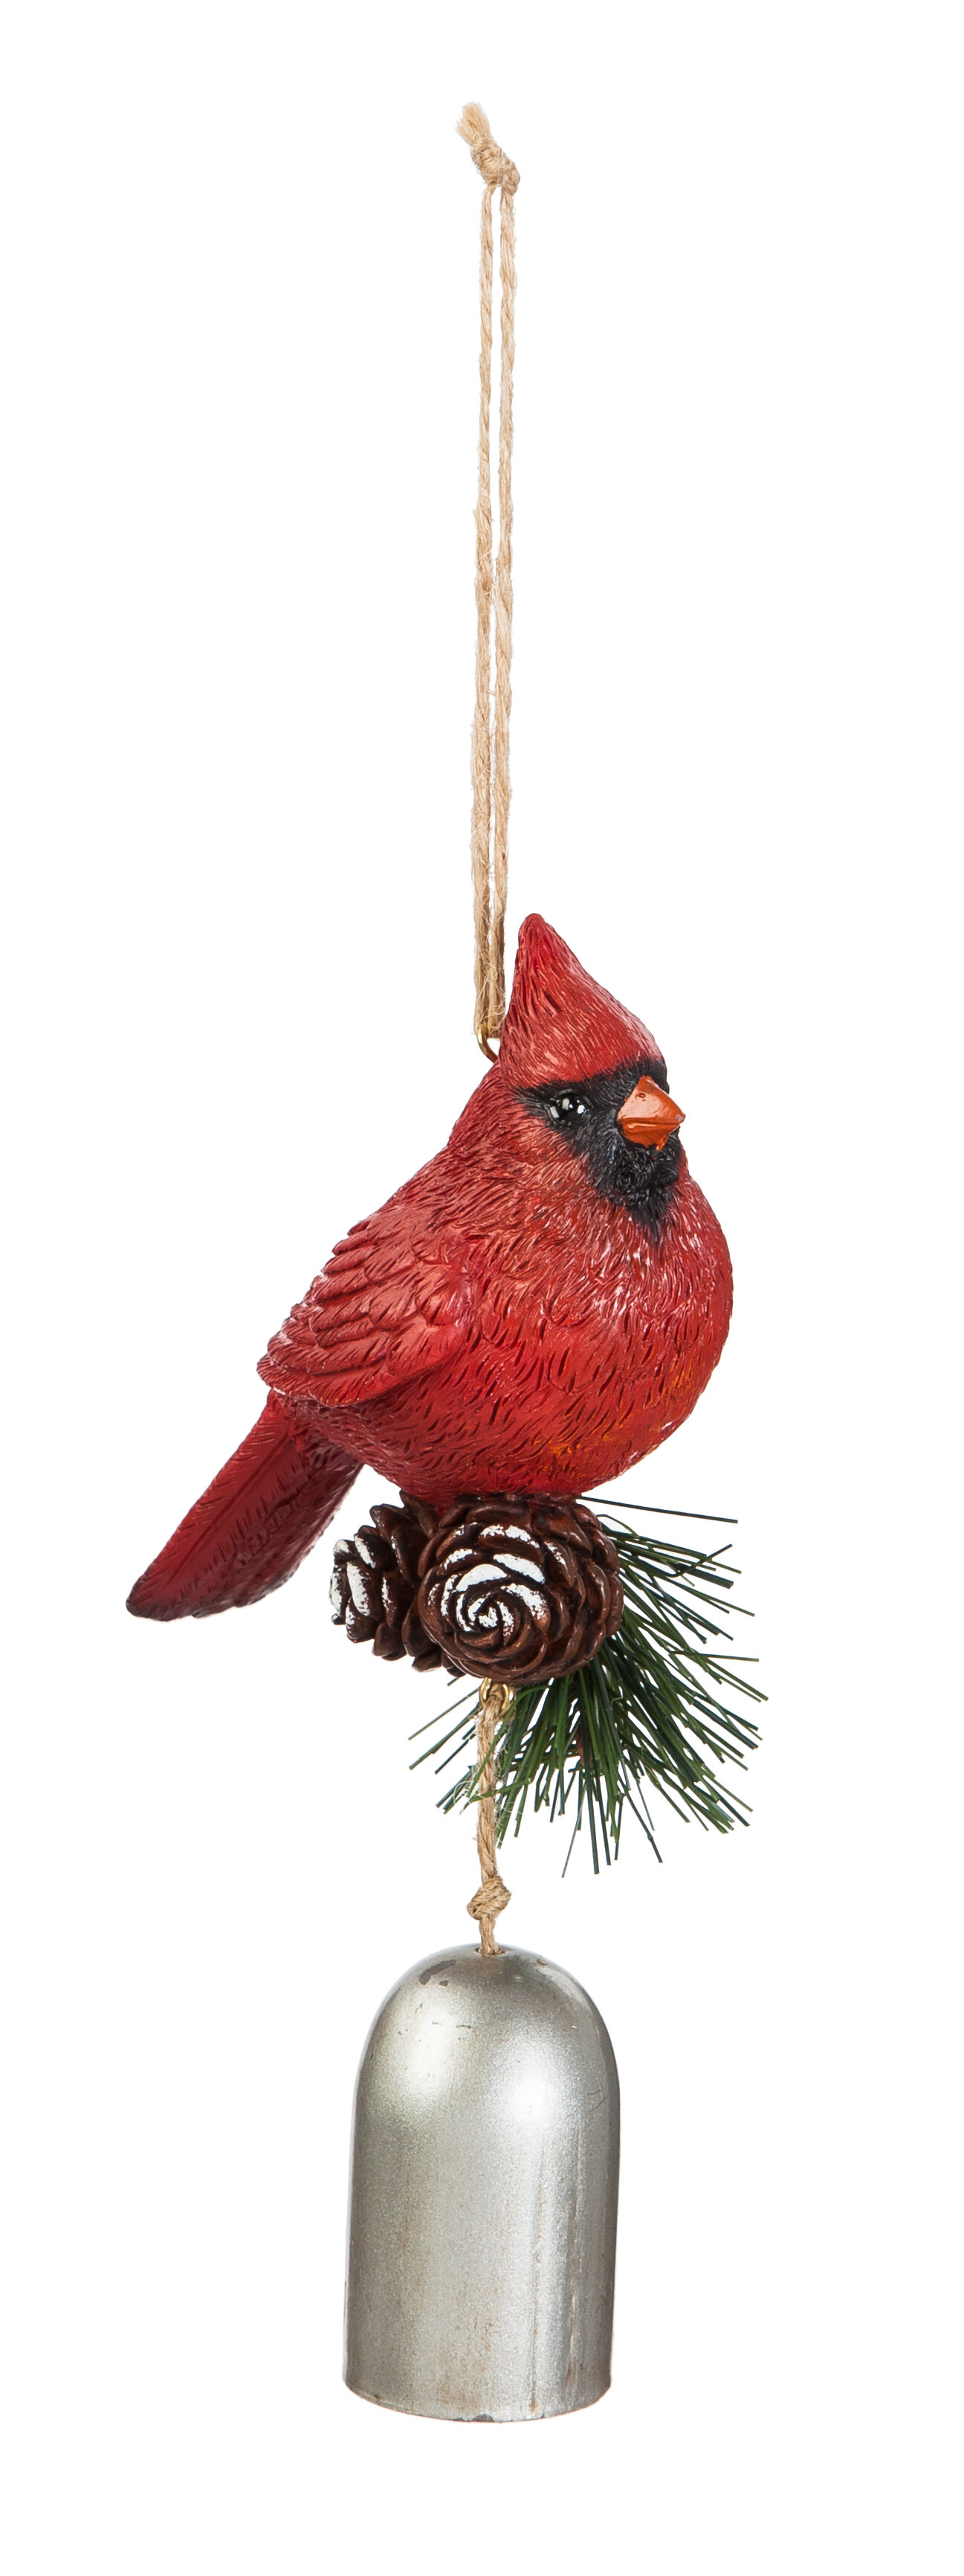 Alcott Hill Polystone Cardinal Hanging Figurine Ornament Reviews Wayfair